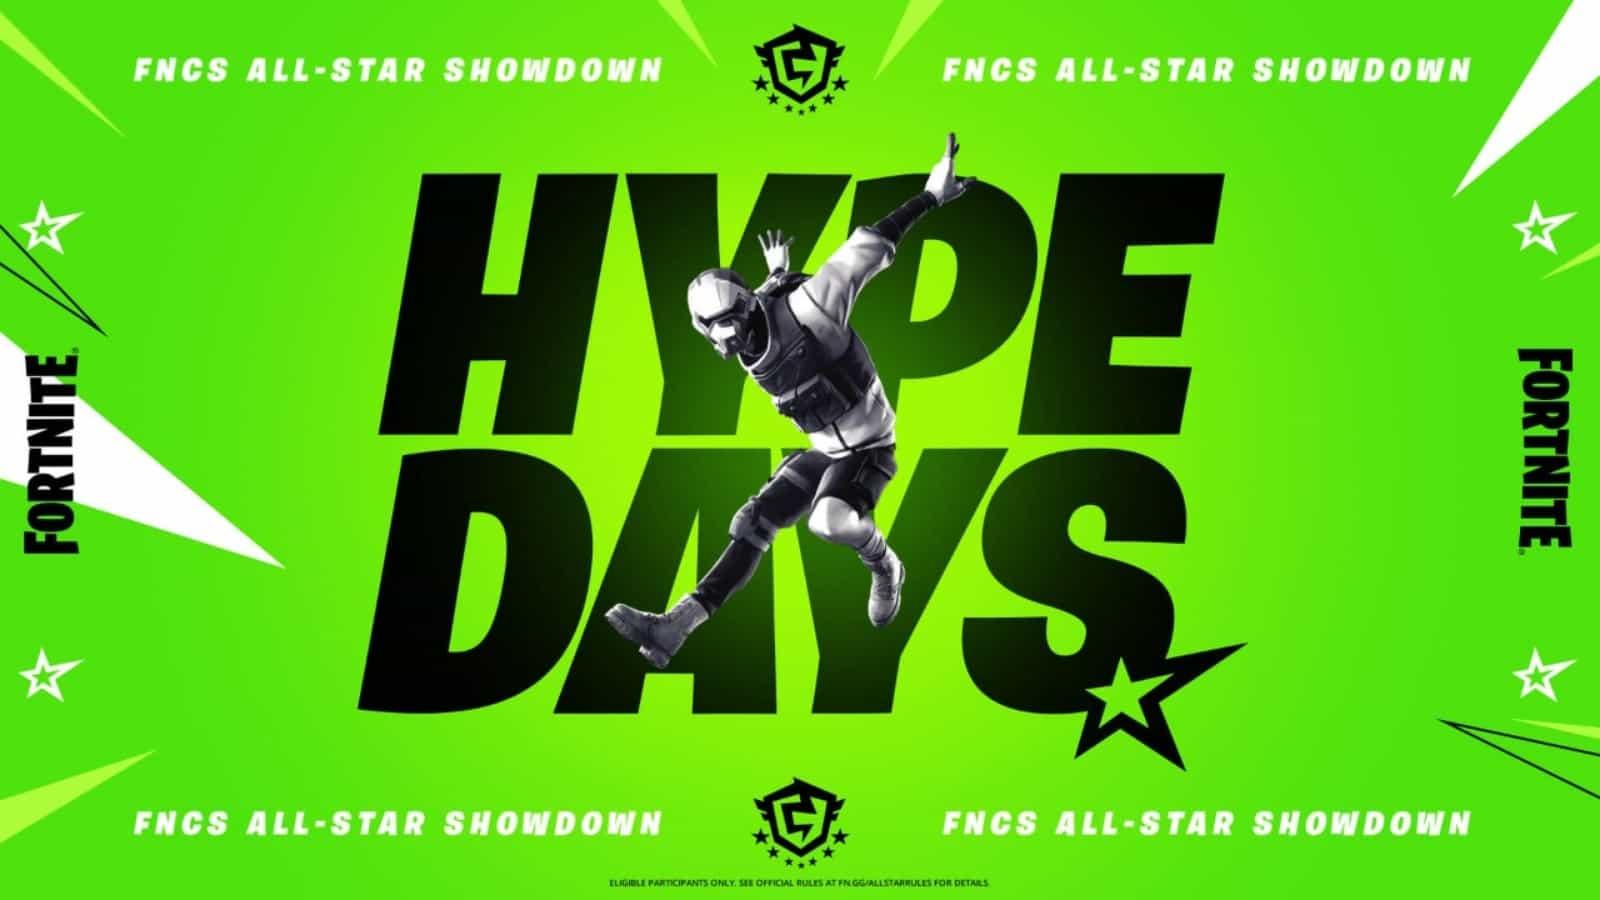 Fortnite FNCS Rewards: All-Star Showdown Details